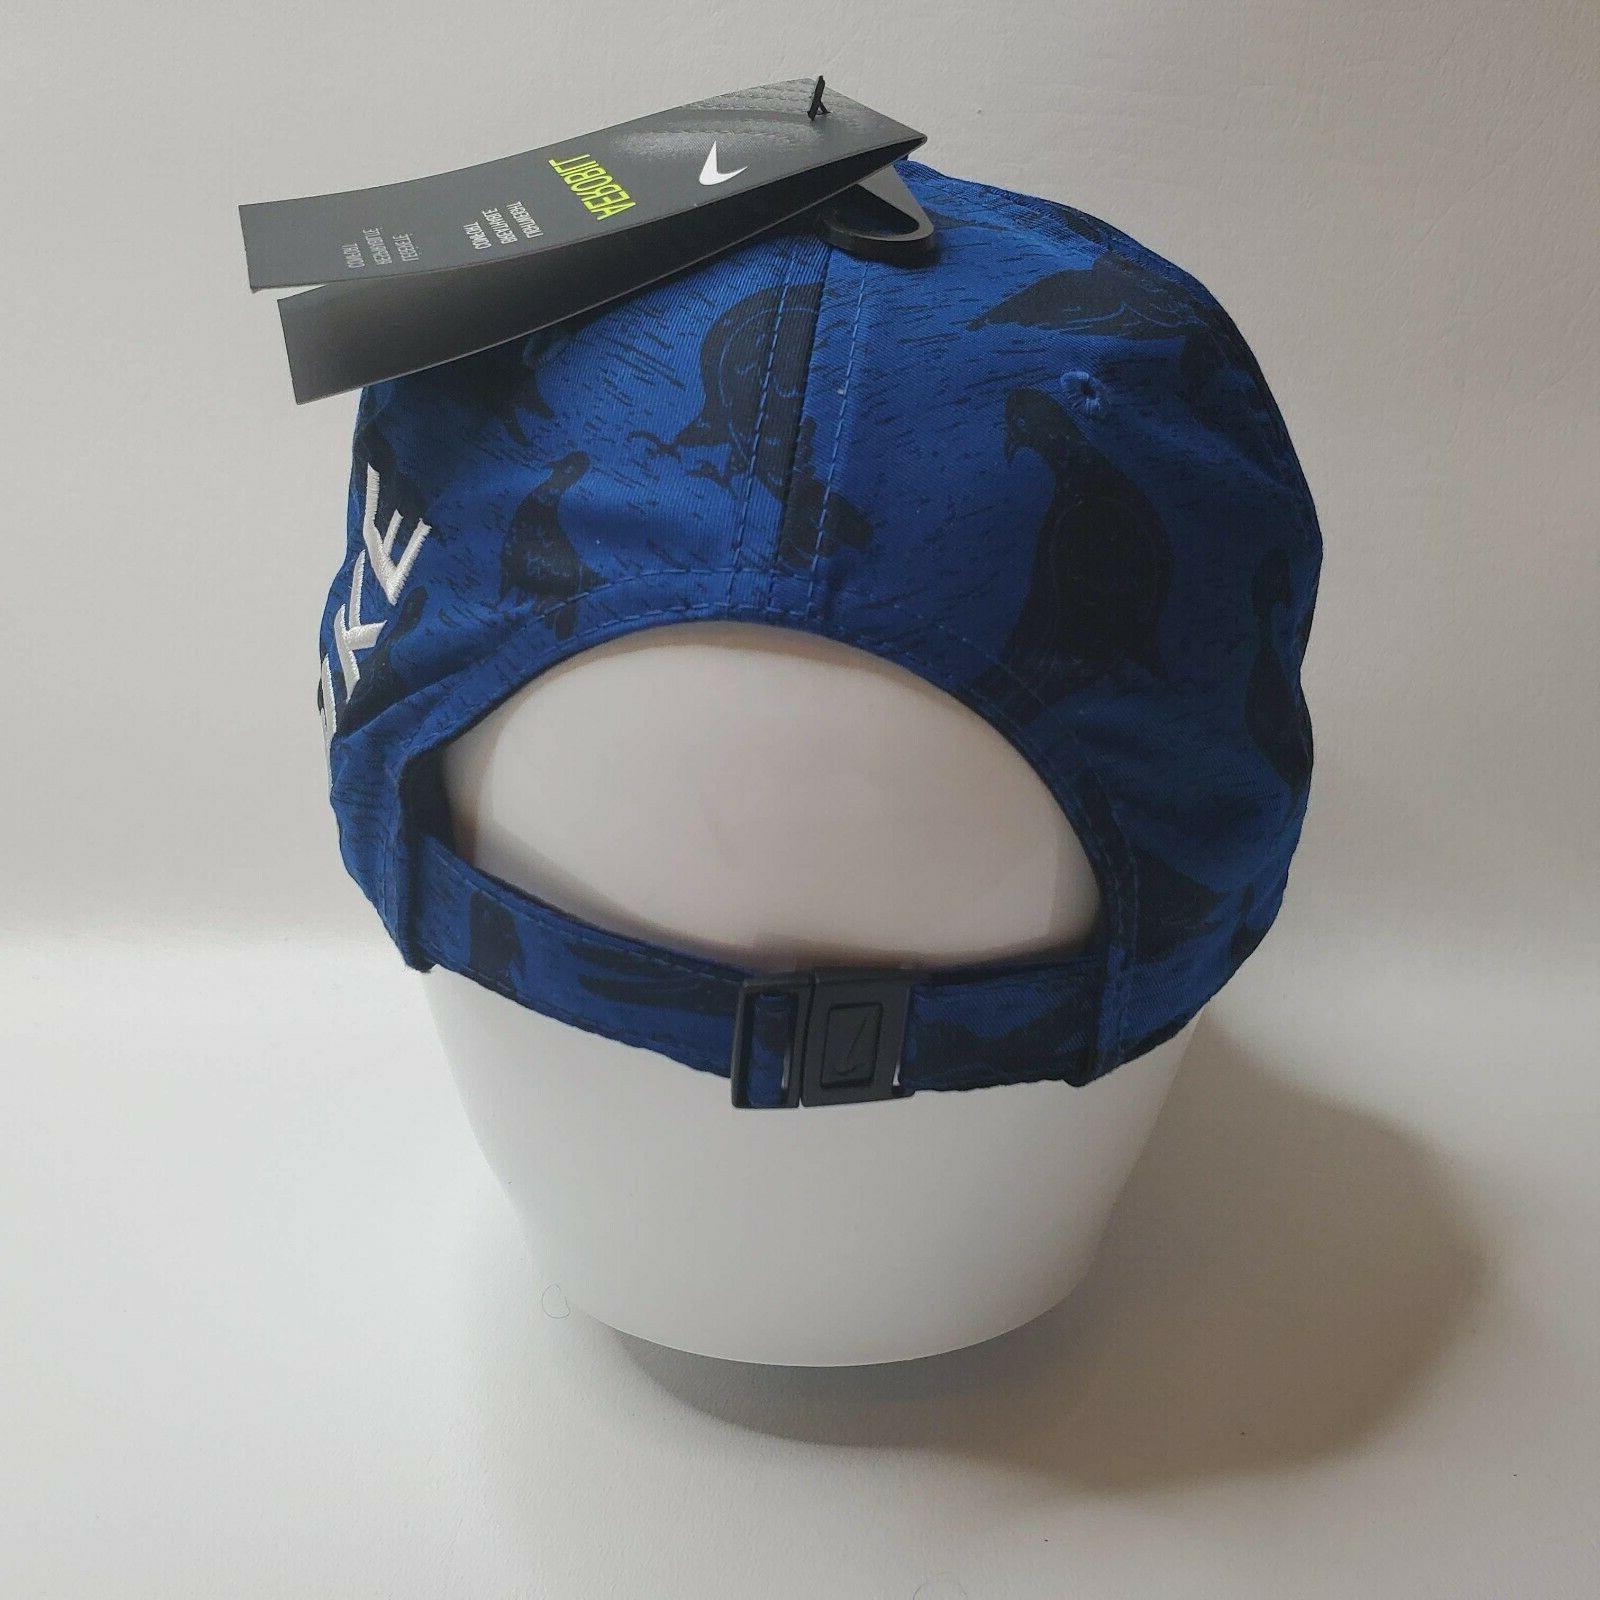 RARE Hat Cap Brooks Koepka BQ1300